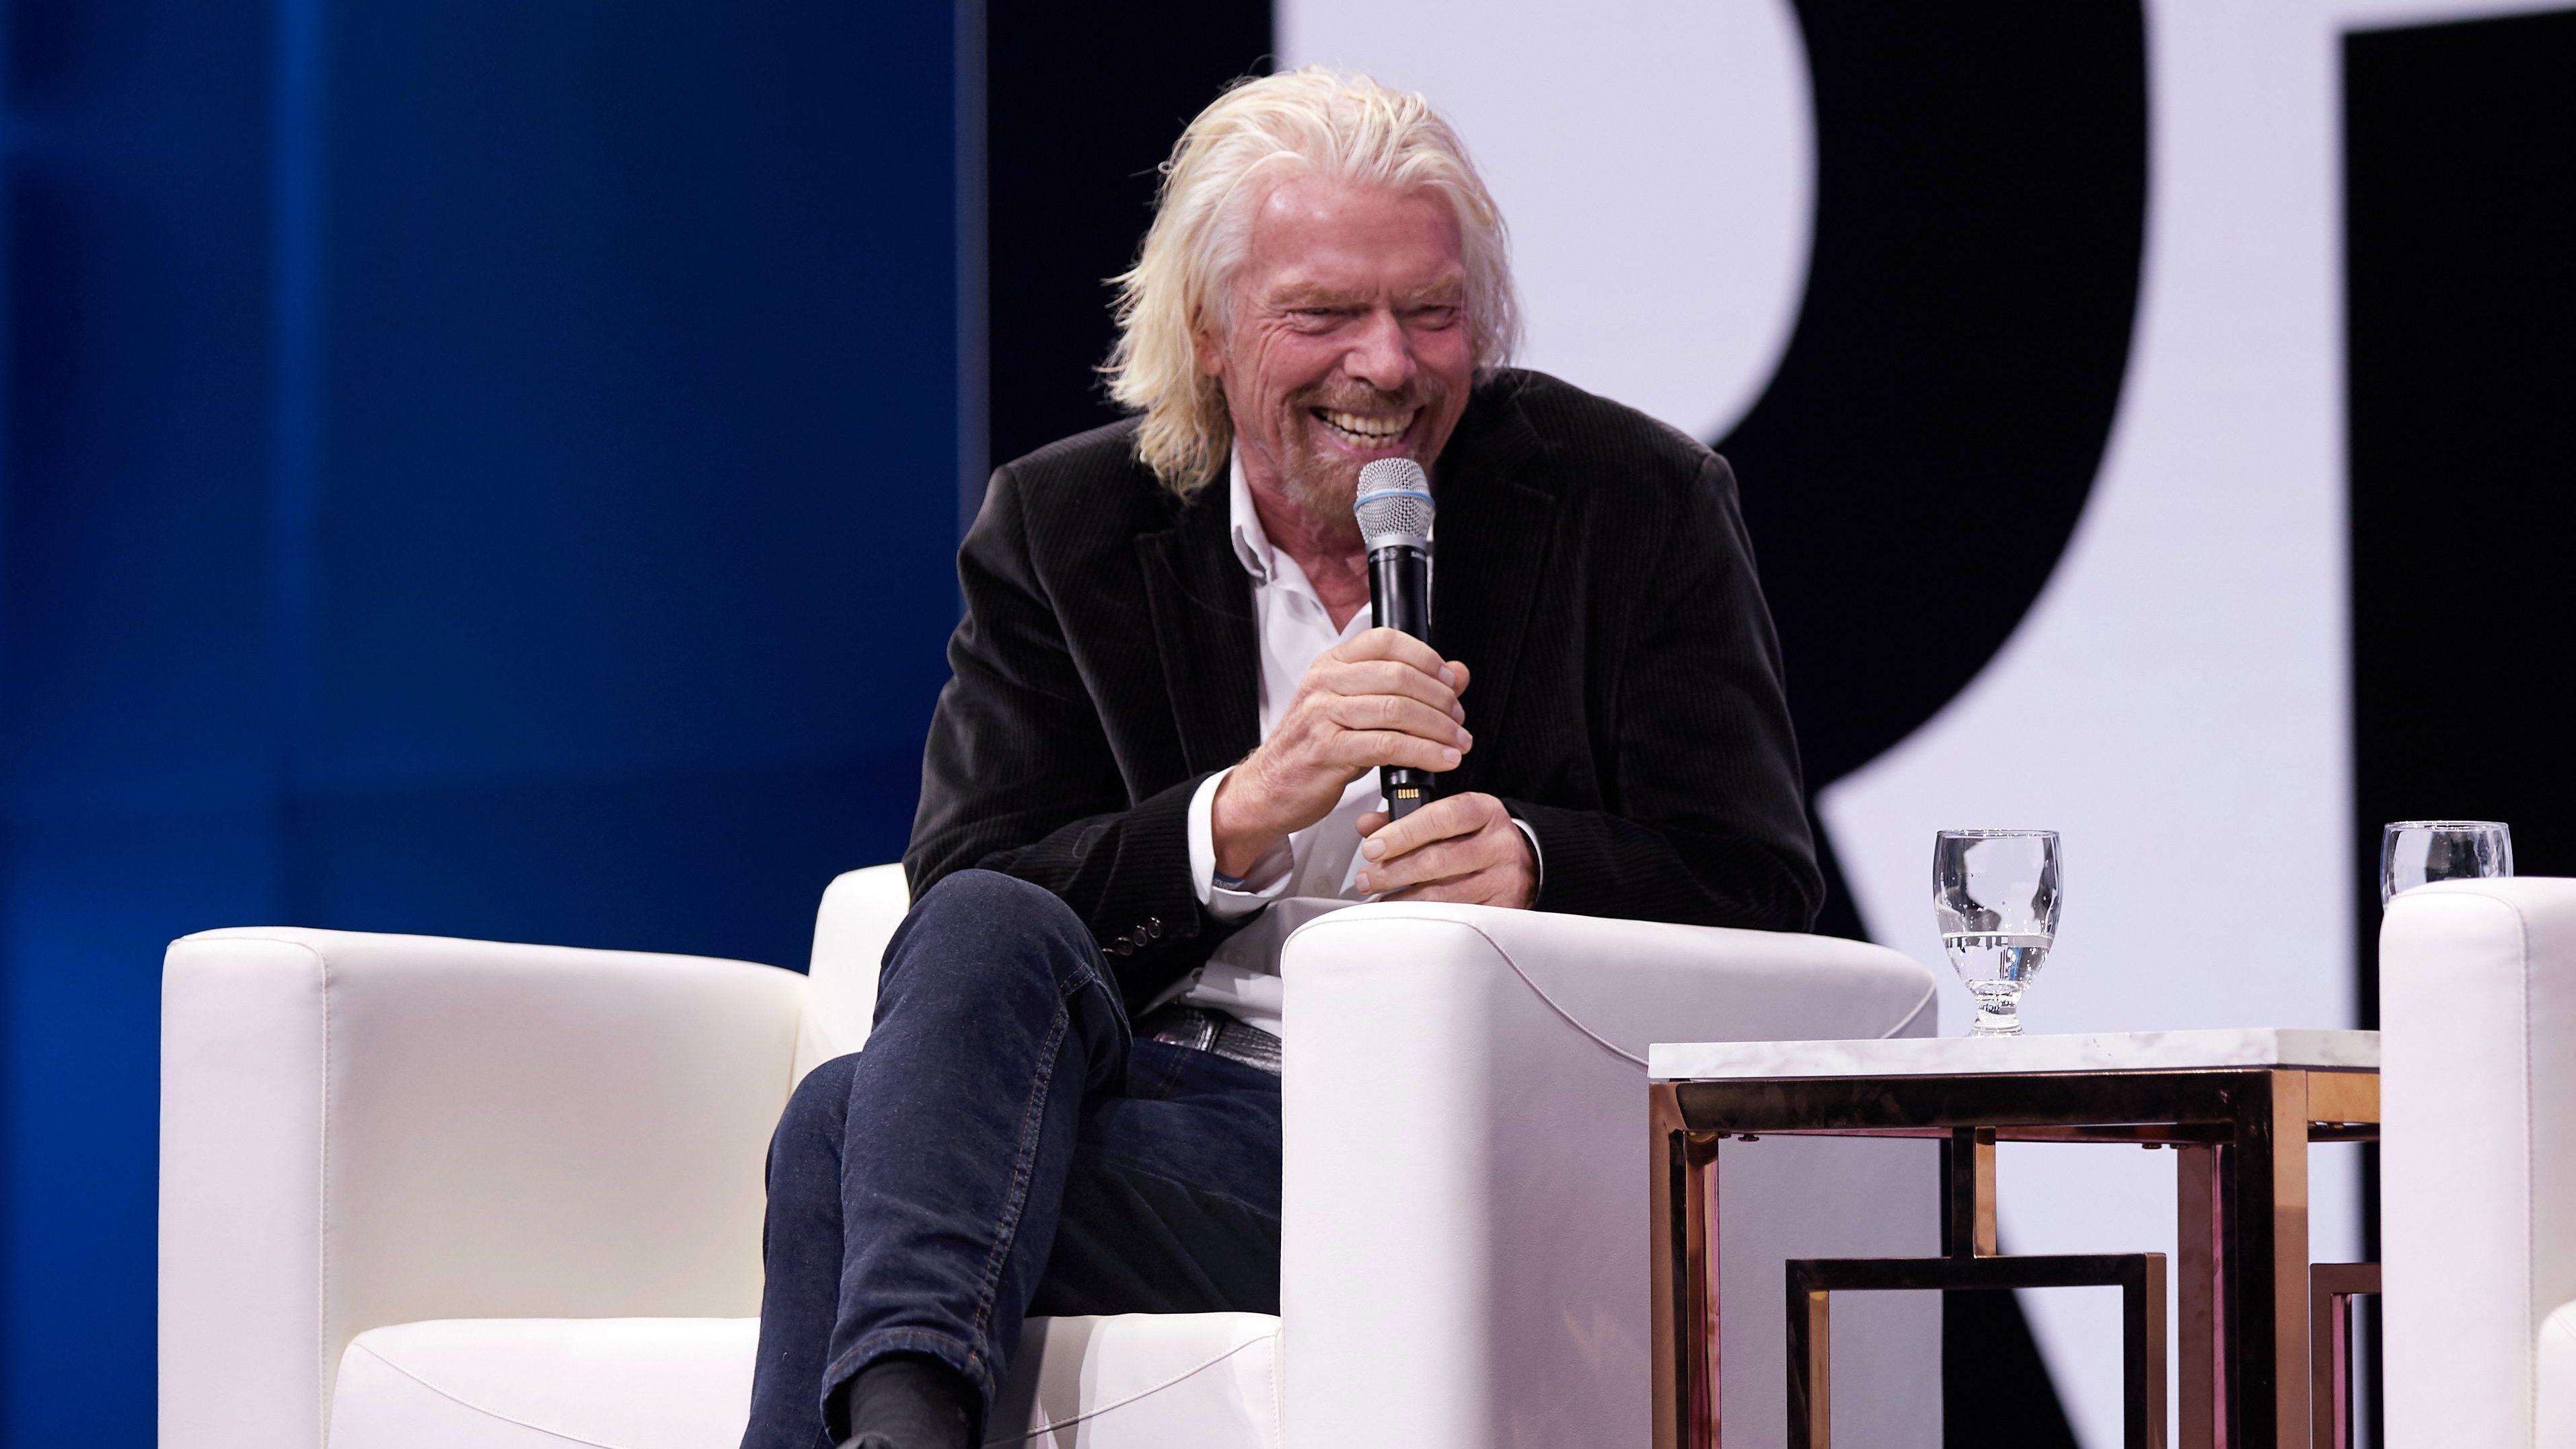 Richard Branson on stage from Qualtrics x4